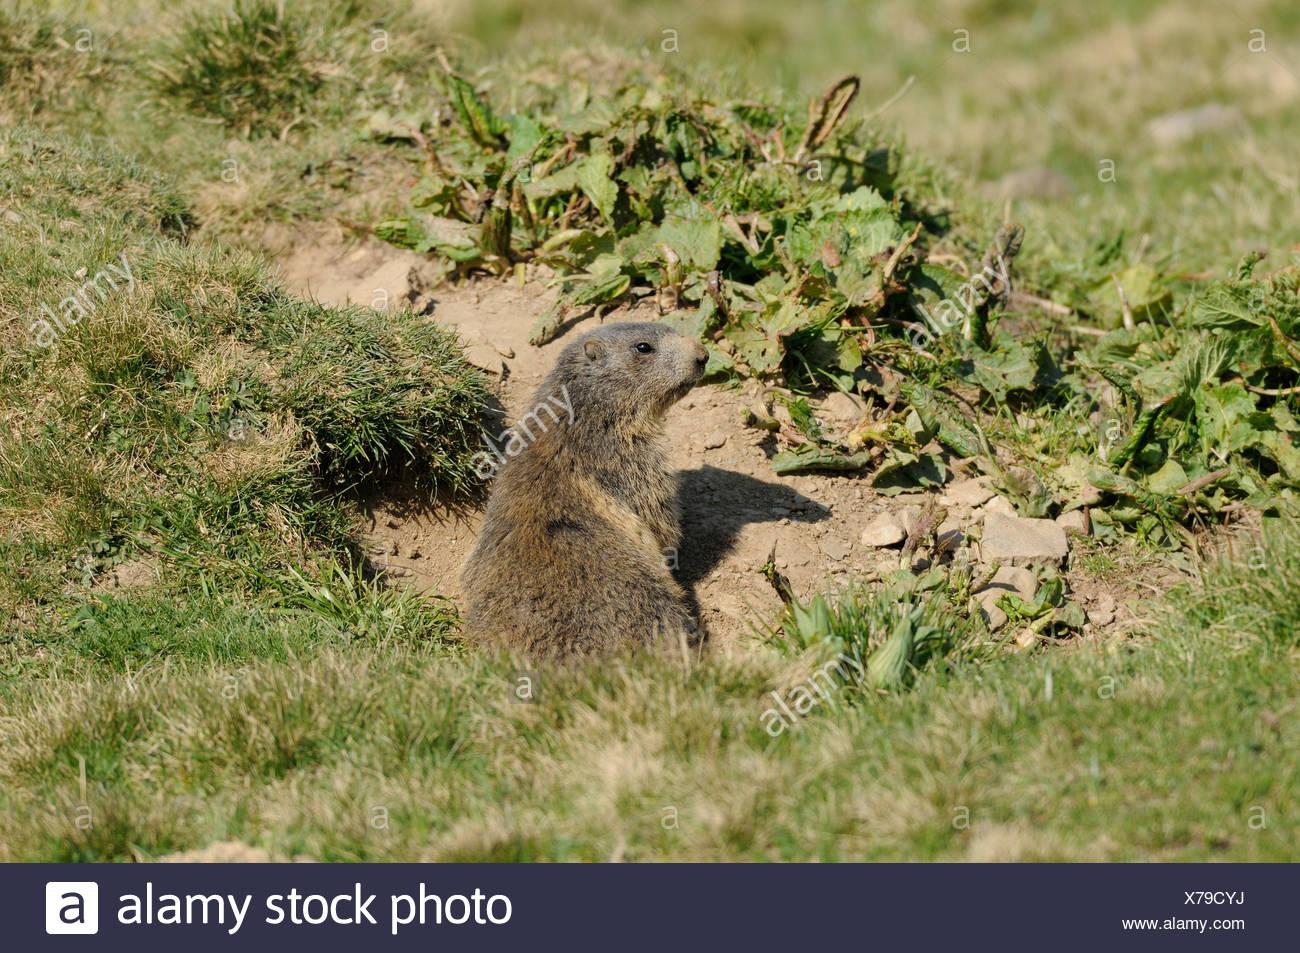 Alpine Marmot, Marmot, Marmota marmota, Sciuridae, animal, rodent, Alps, Alp Präz, Heinzenberg, canton, Grisons, Switzerland - Stock Image